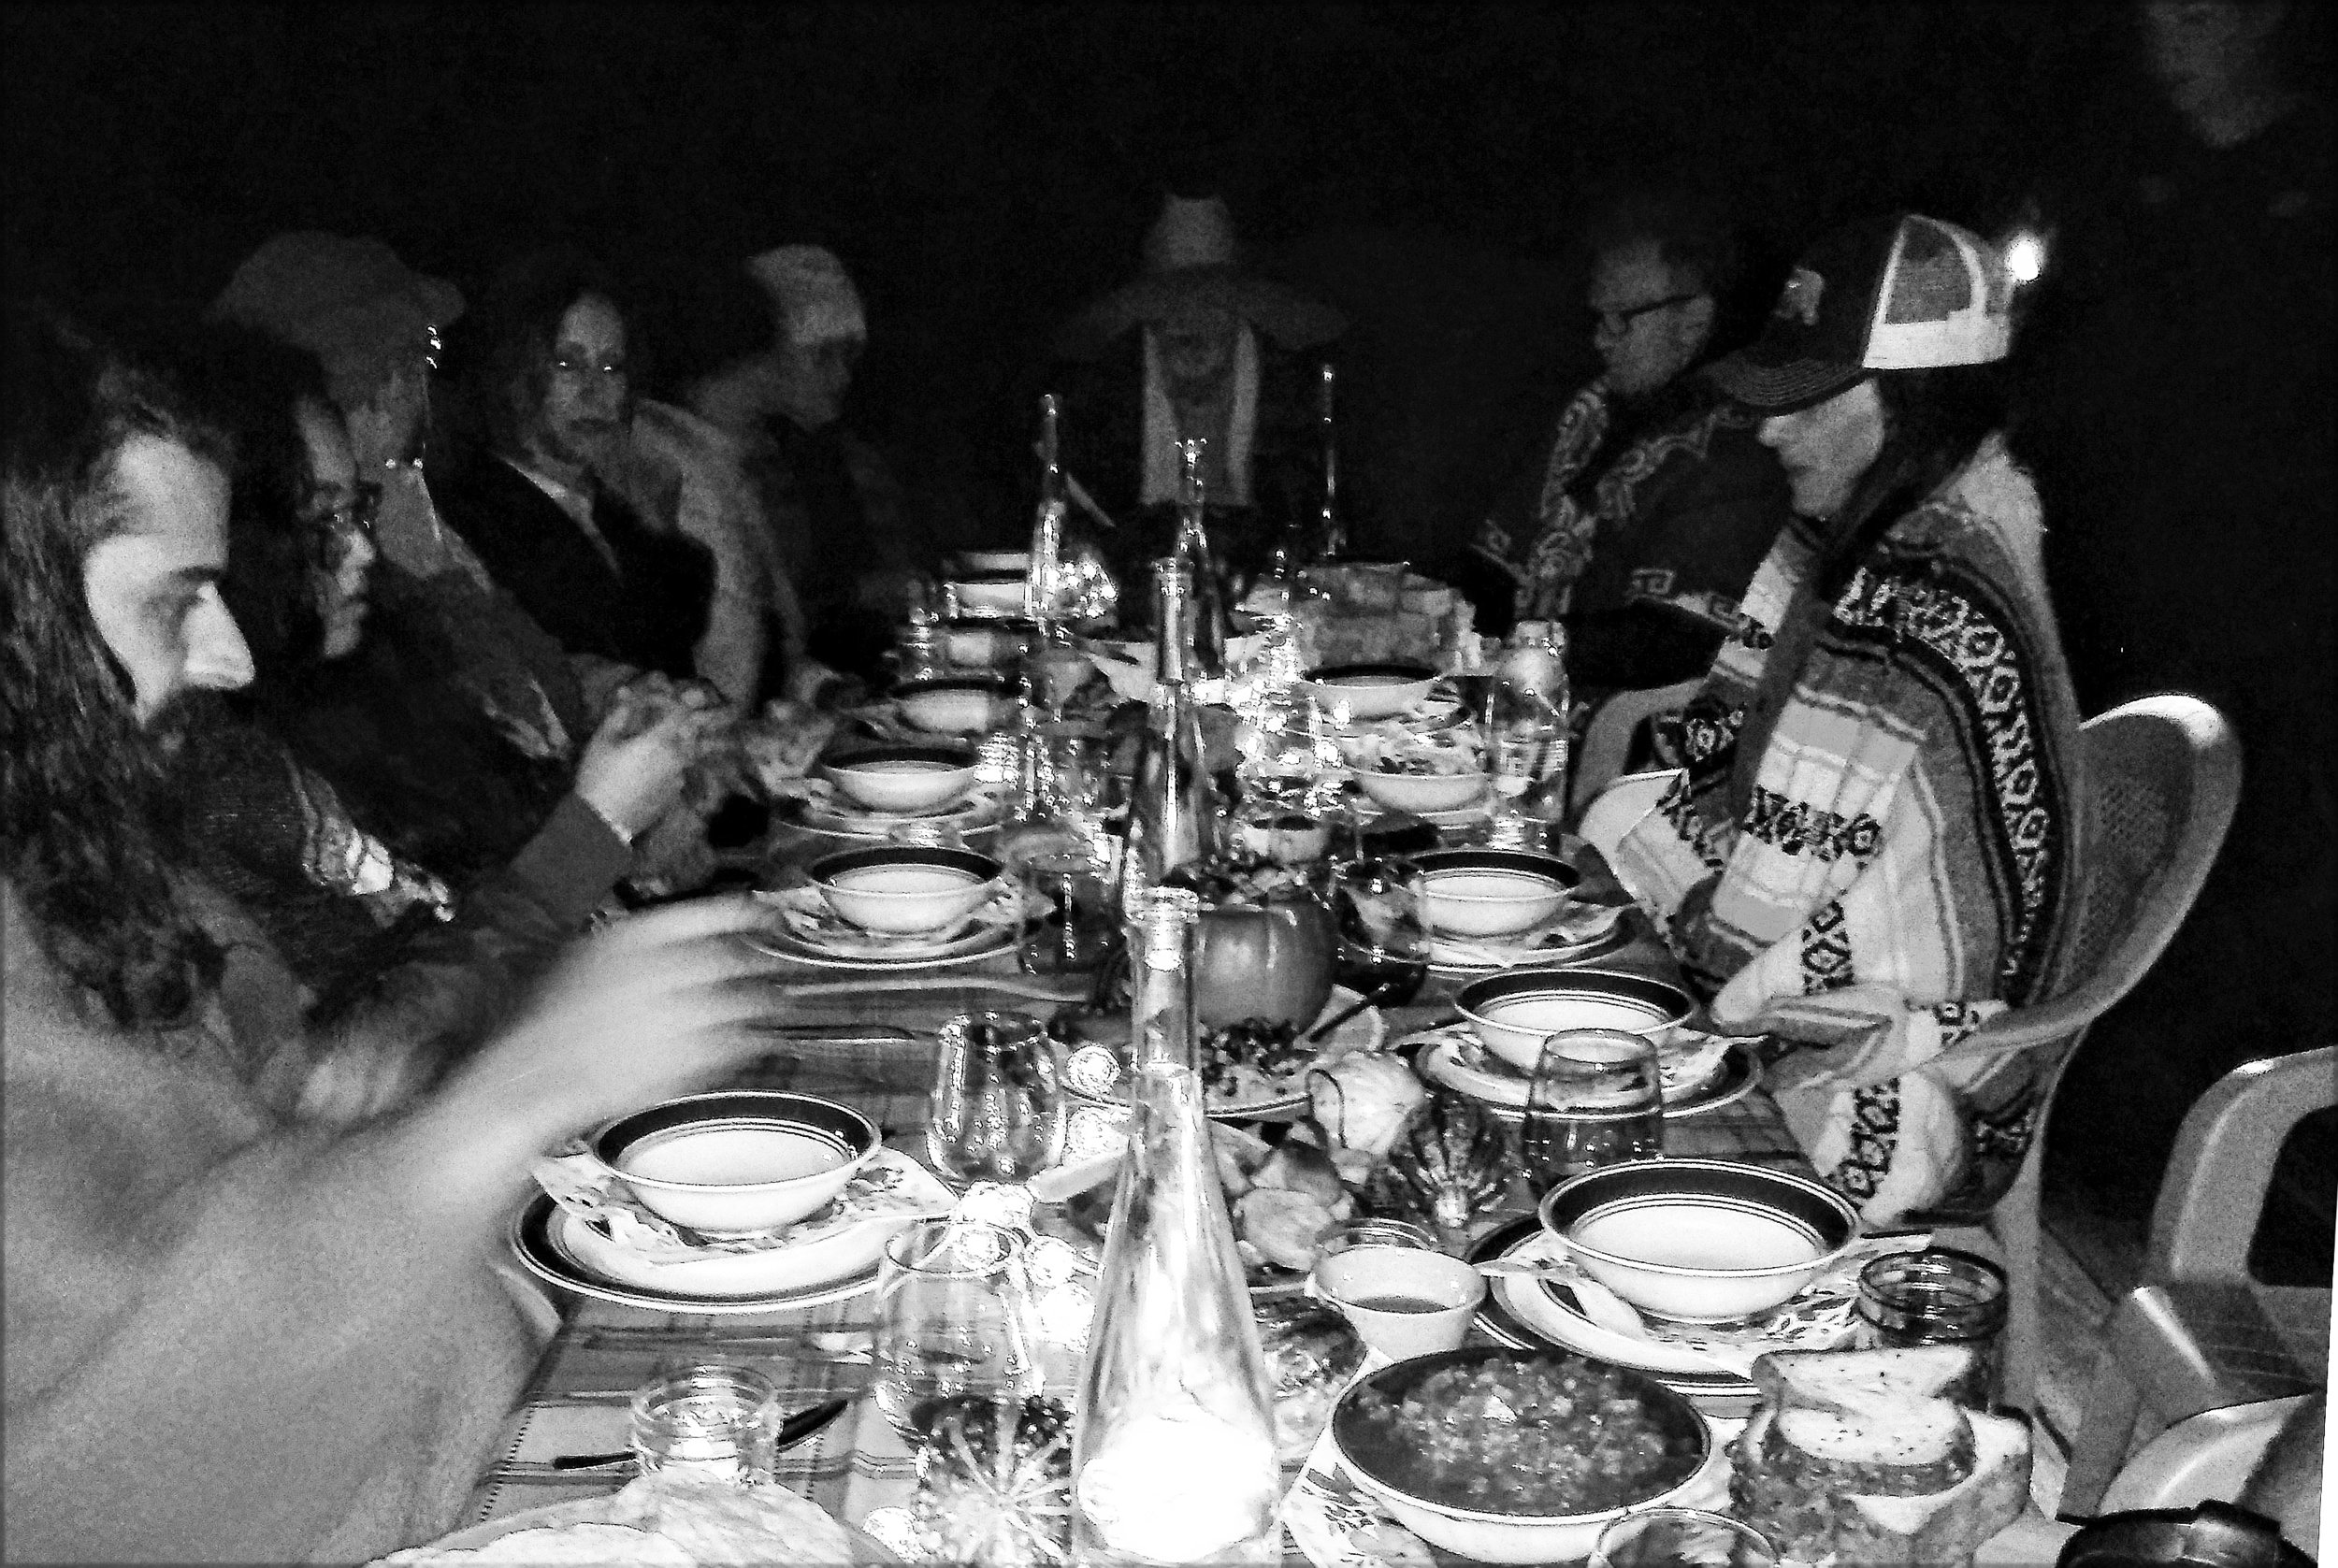 dinnerb&w.jpg